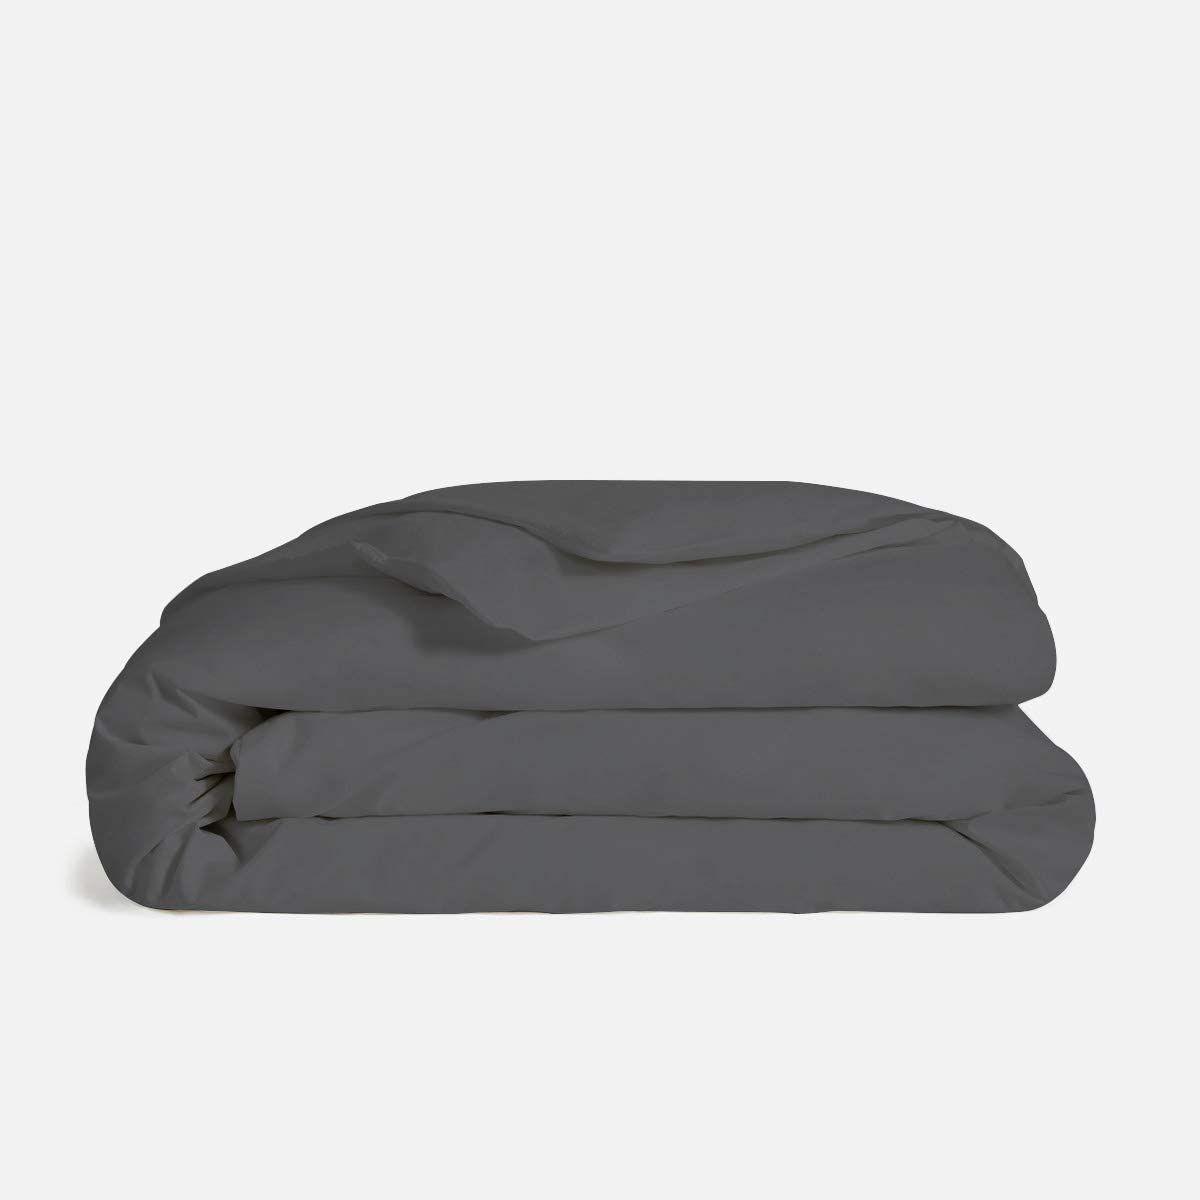 Comfy Sheets Luxury 100% Egyptian Cotton - Genuine 1000 Thread Count 6 Piece Queen Dark Grey Sheet Set-Fits Mattress Up to 18'' Deep Pocket.